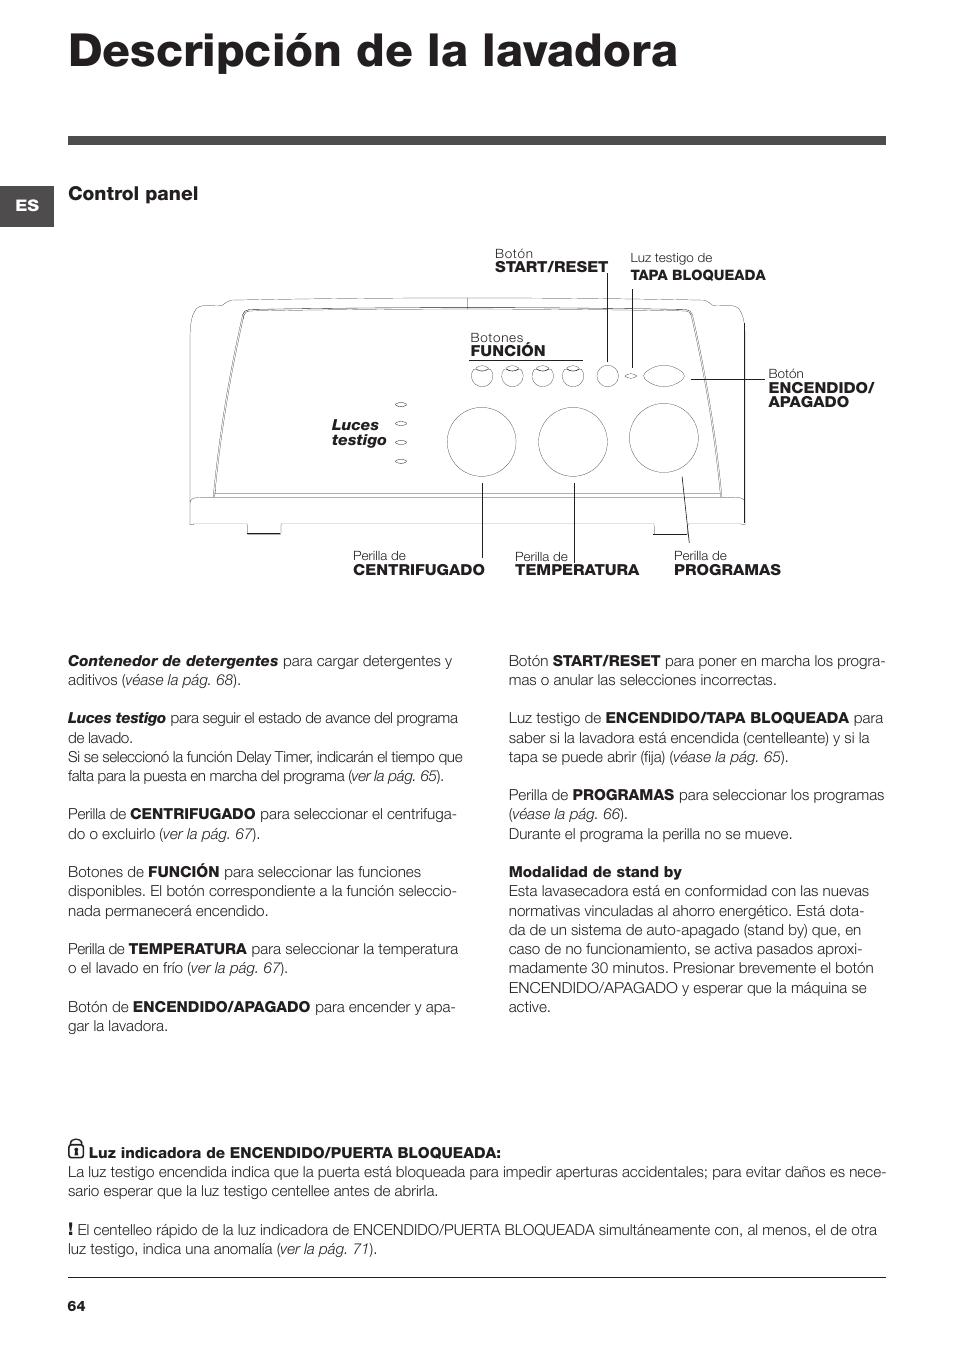 Descripcion De La Lavadora Control Panel